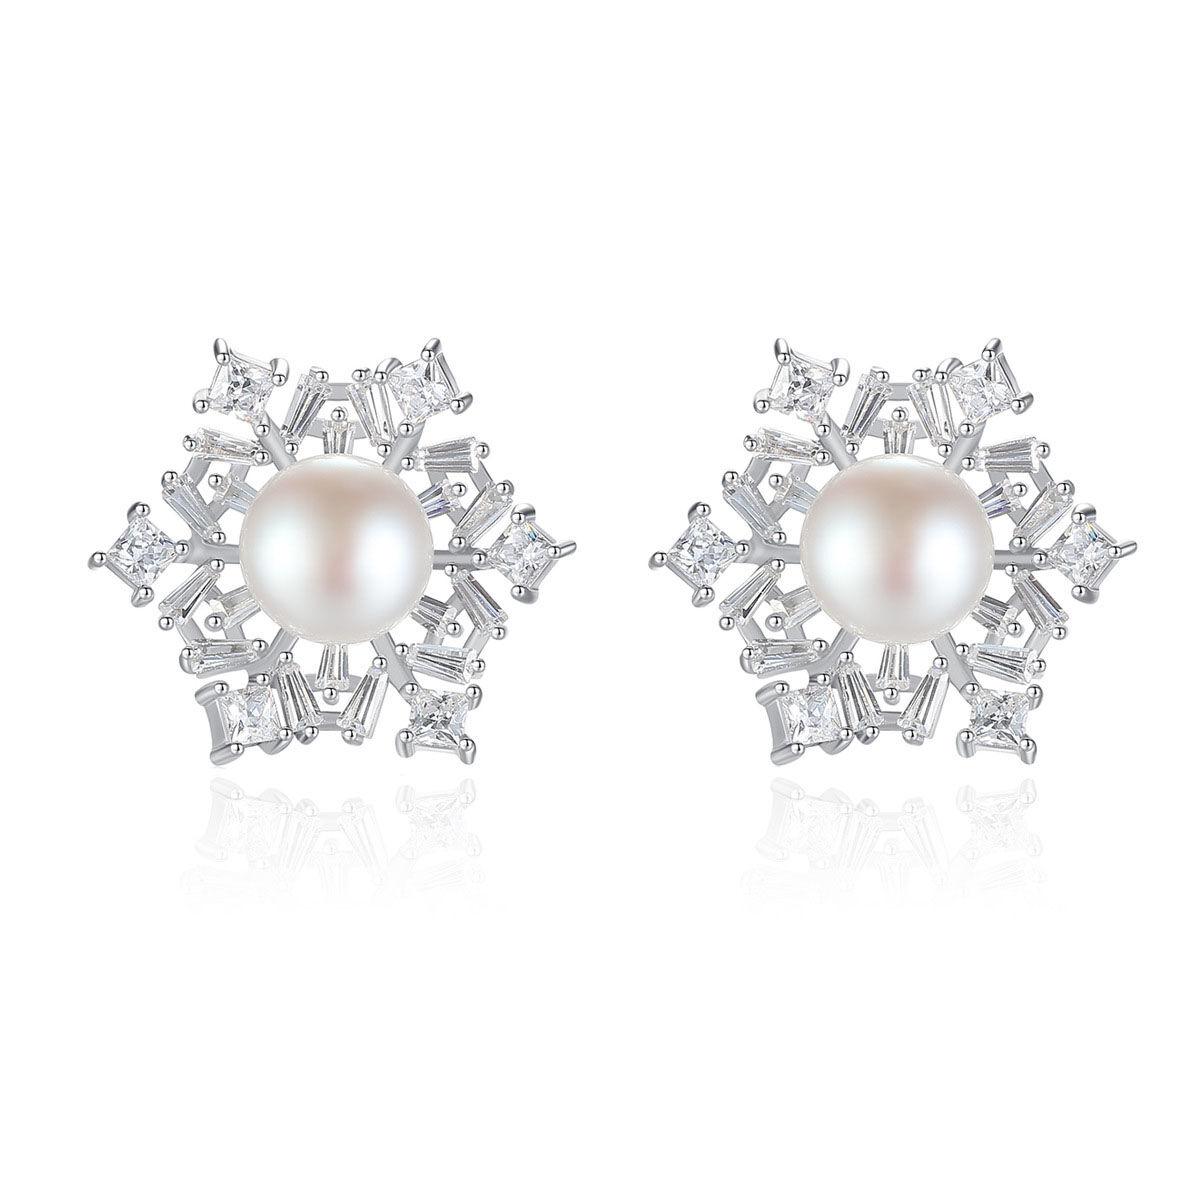 silverbene Lady Natural Pearl CZ Snowflake 925 Silver Studs Earrings